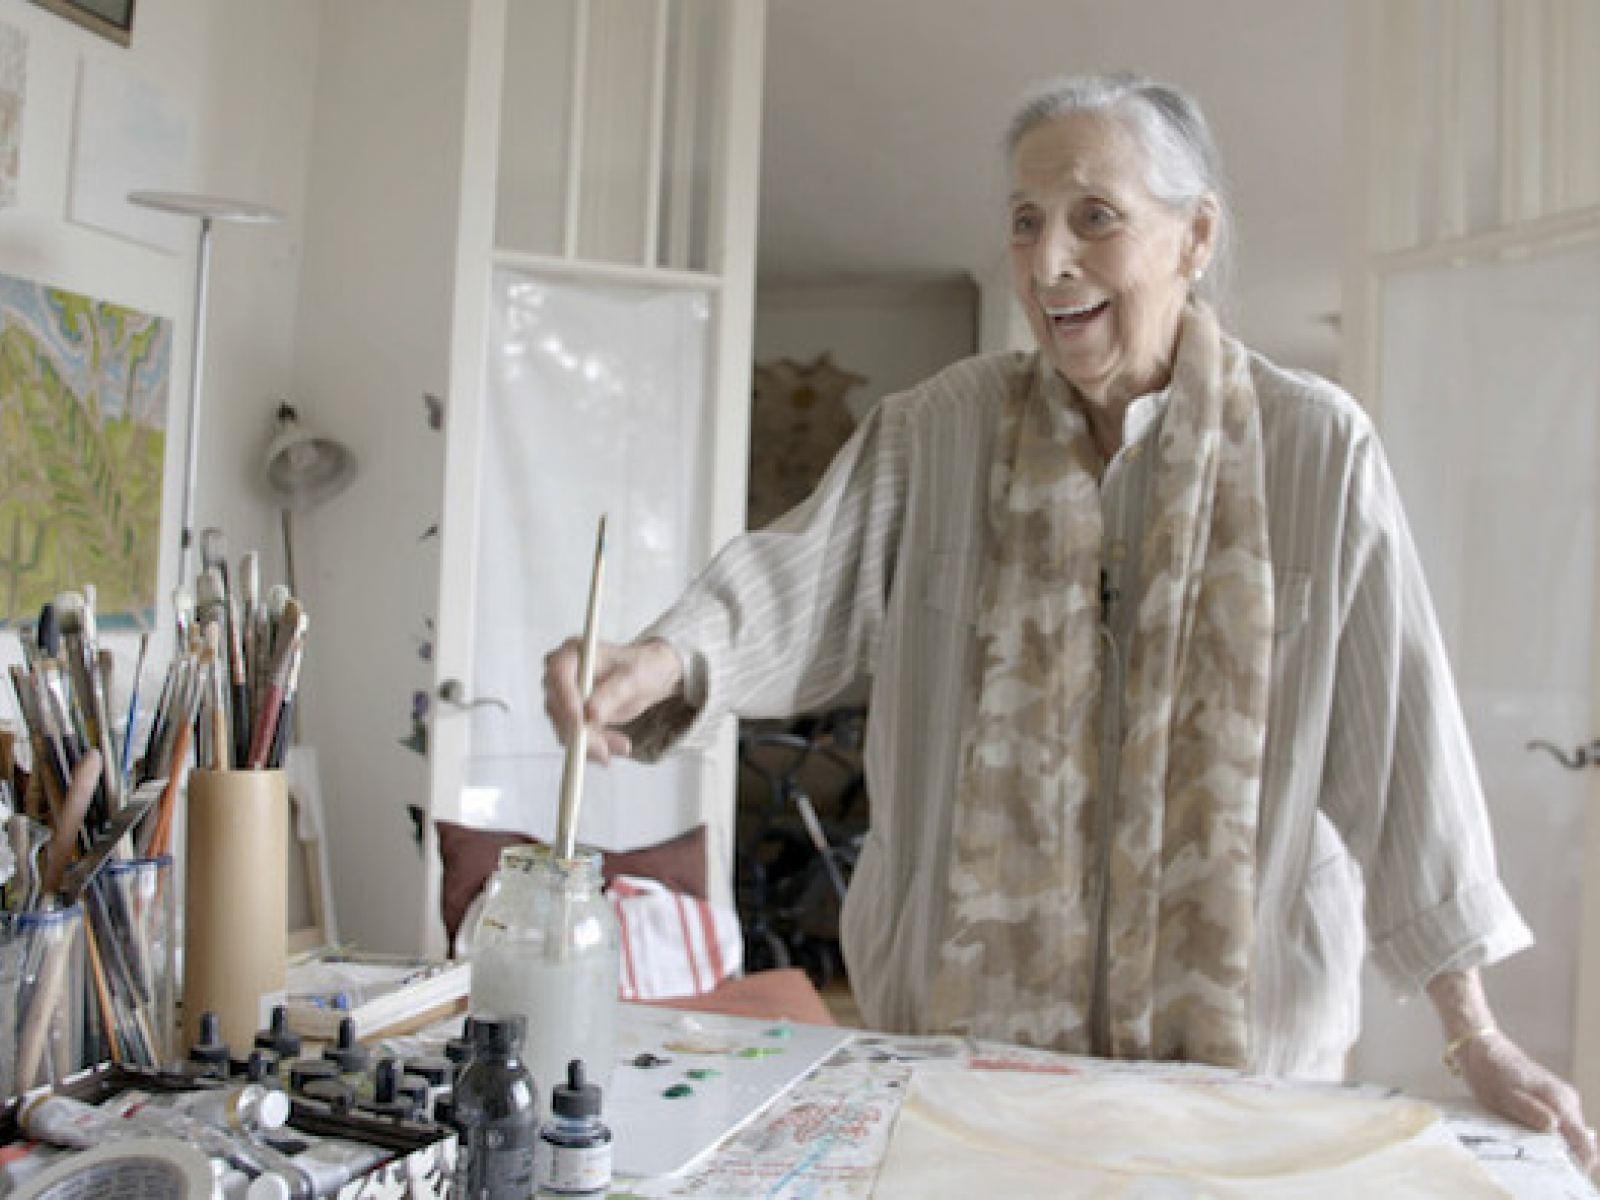 Luchita Hurtado at work in her studio, Santa Monica, California, 2019. Production still from the Art21 'Extended Play' film. © Art21 Inc., 2019.